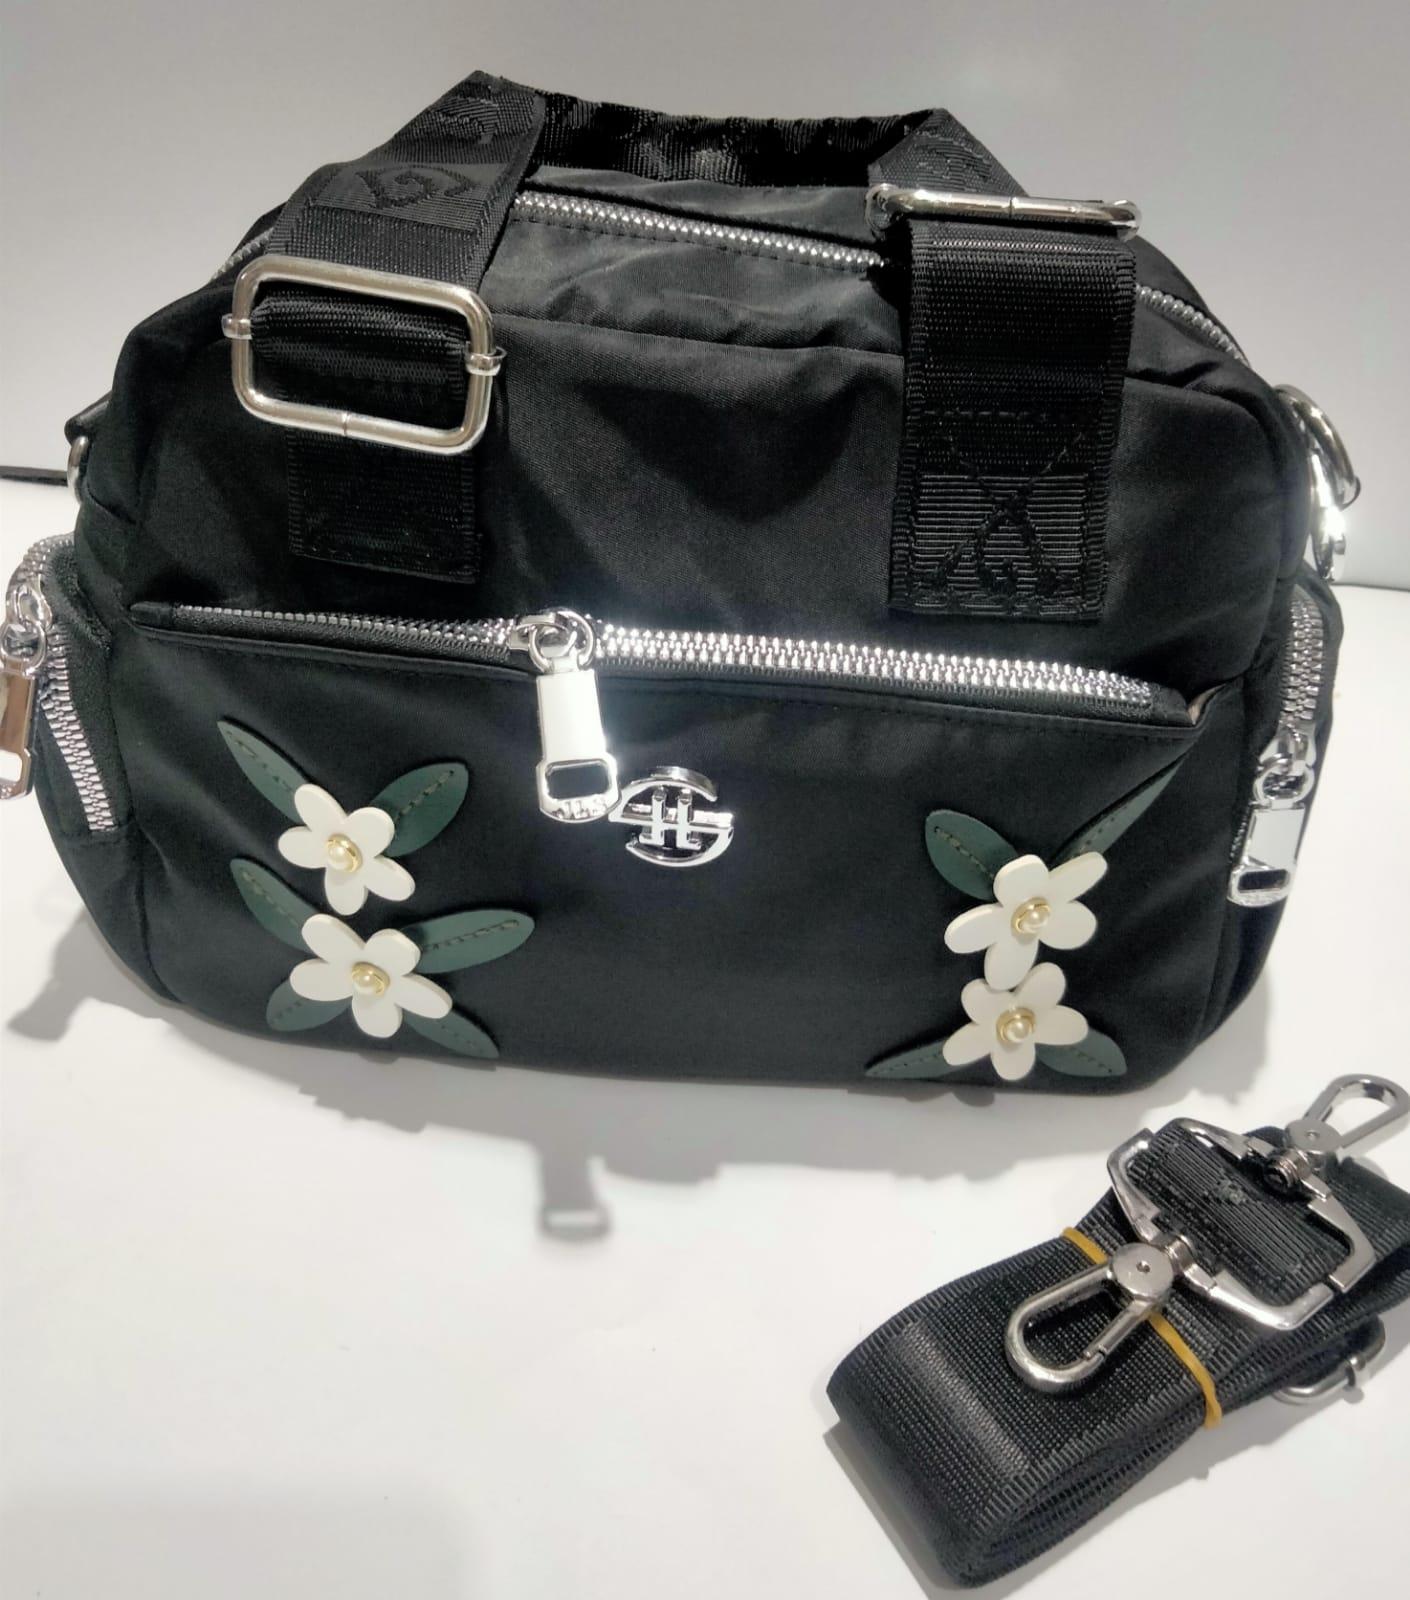 Fashion Women Ladies Girls Hand Bags Shoulder Bag Messenger Bag Parachute Nylon Crossbody Bags Water Proof Large